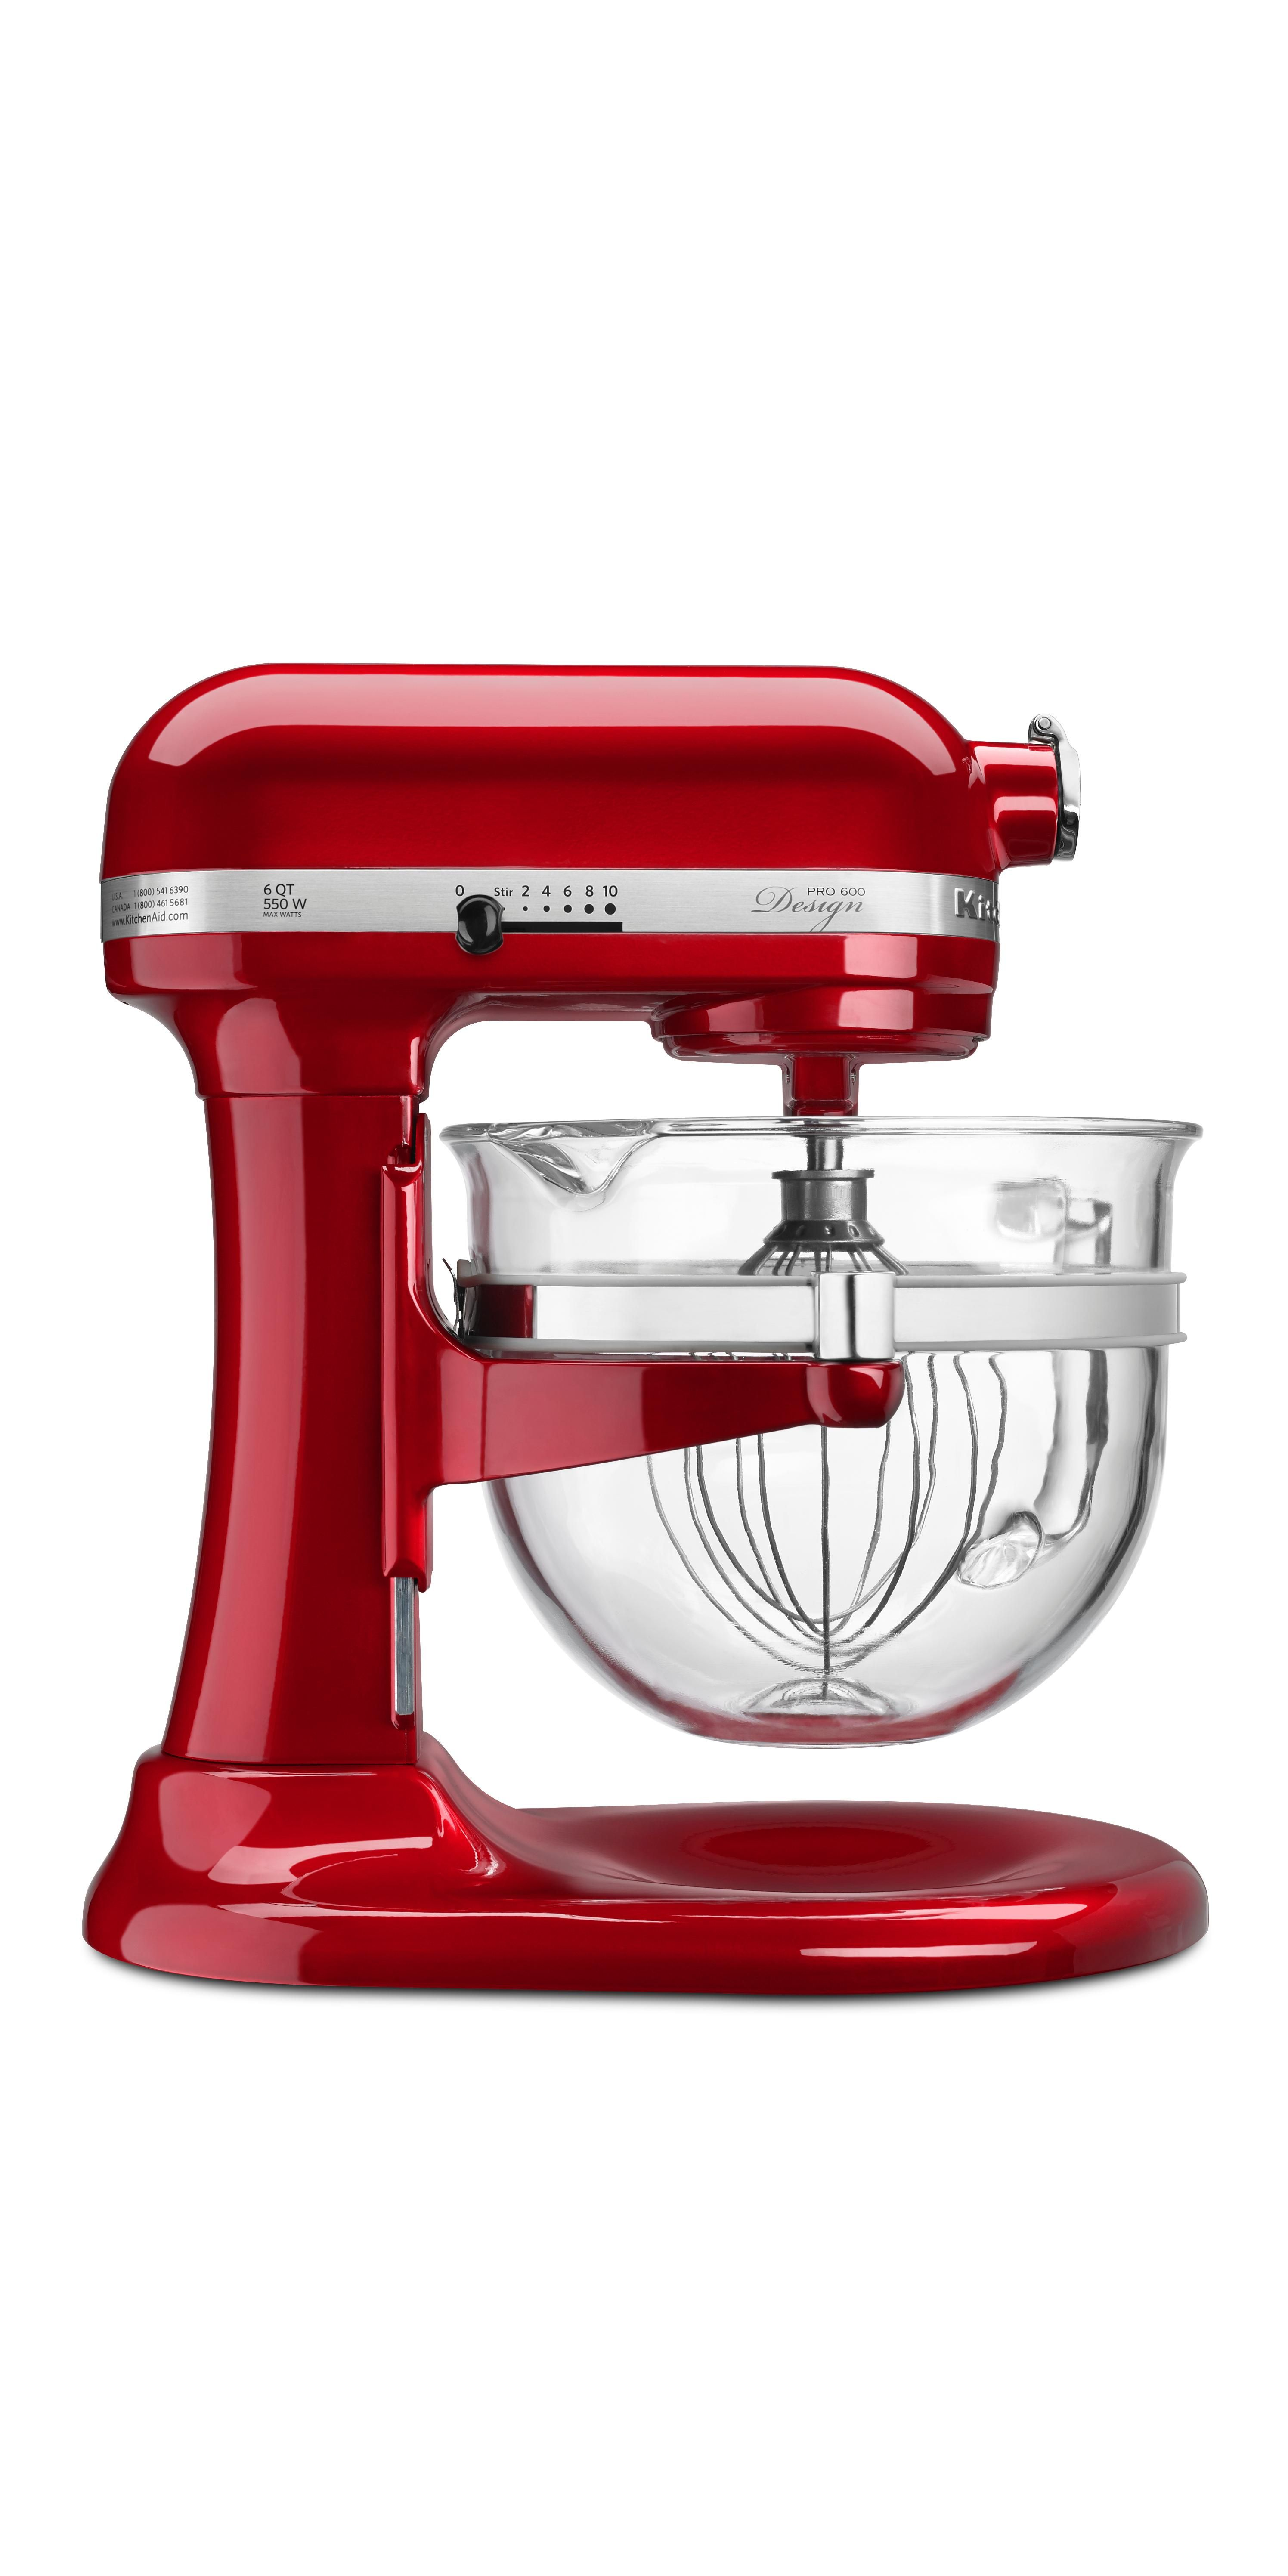 Amazon Com Kitchenaid Ksm150pser 5 Qt Artisan Series With Pouring